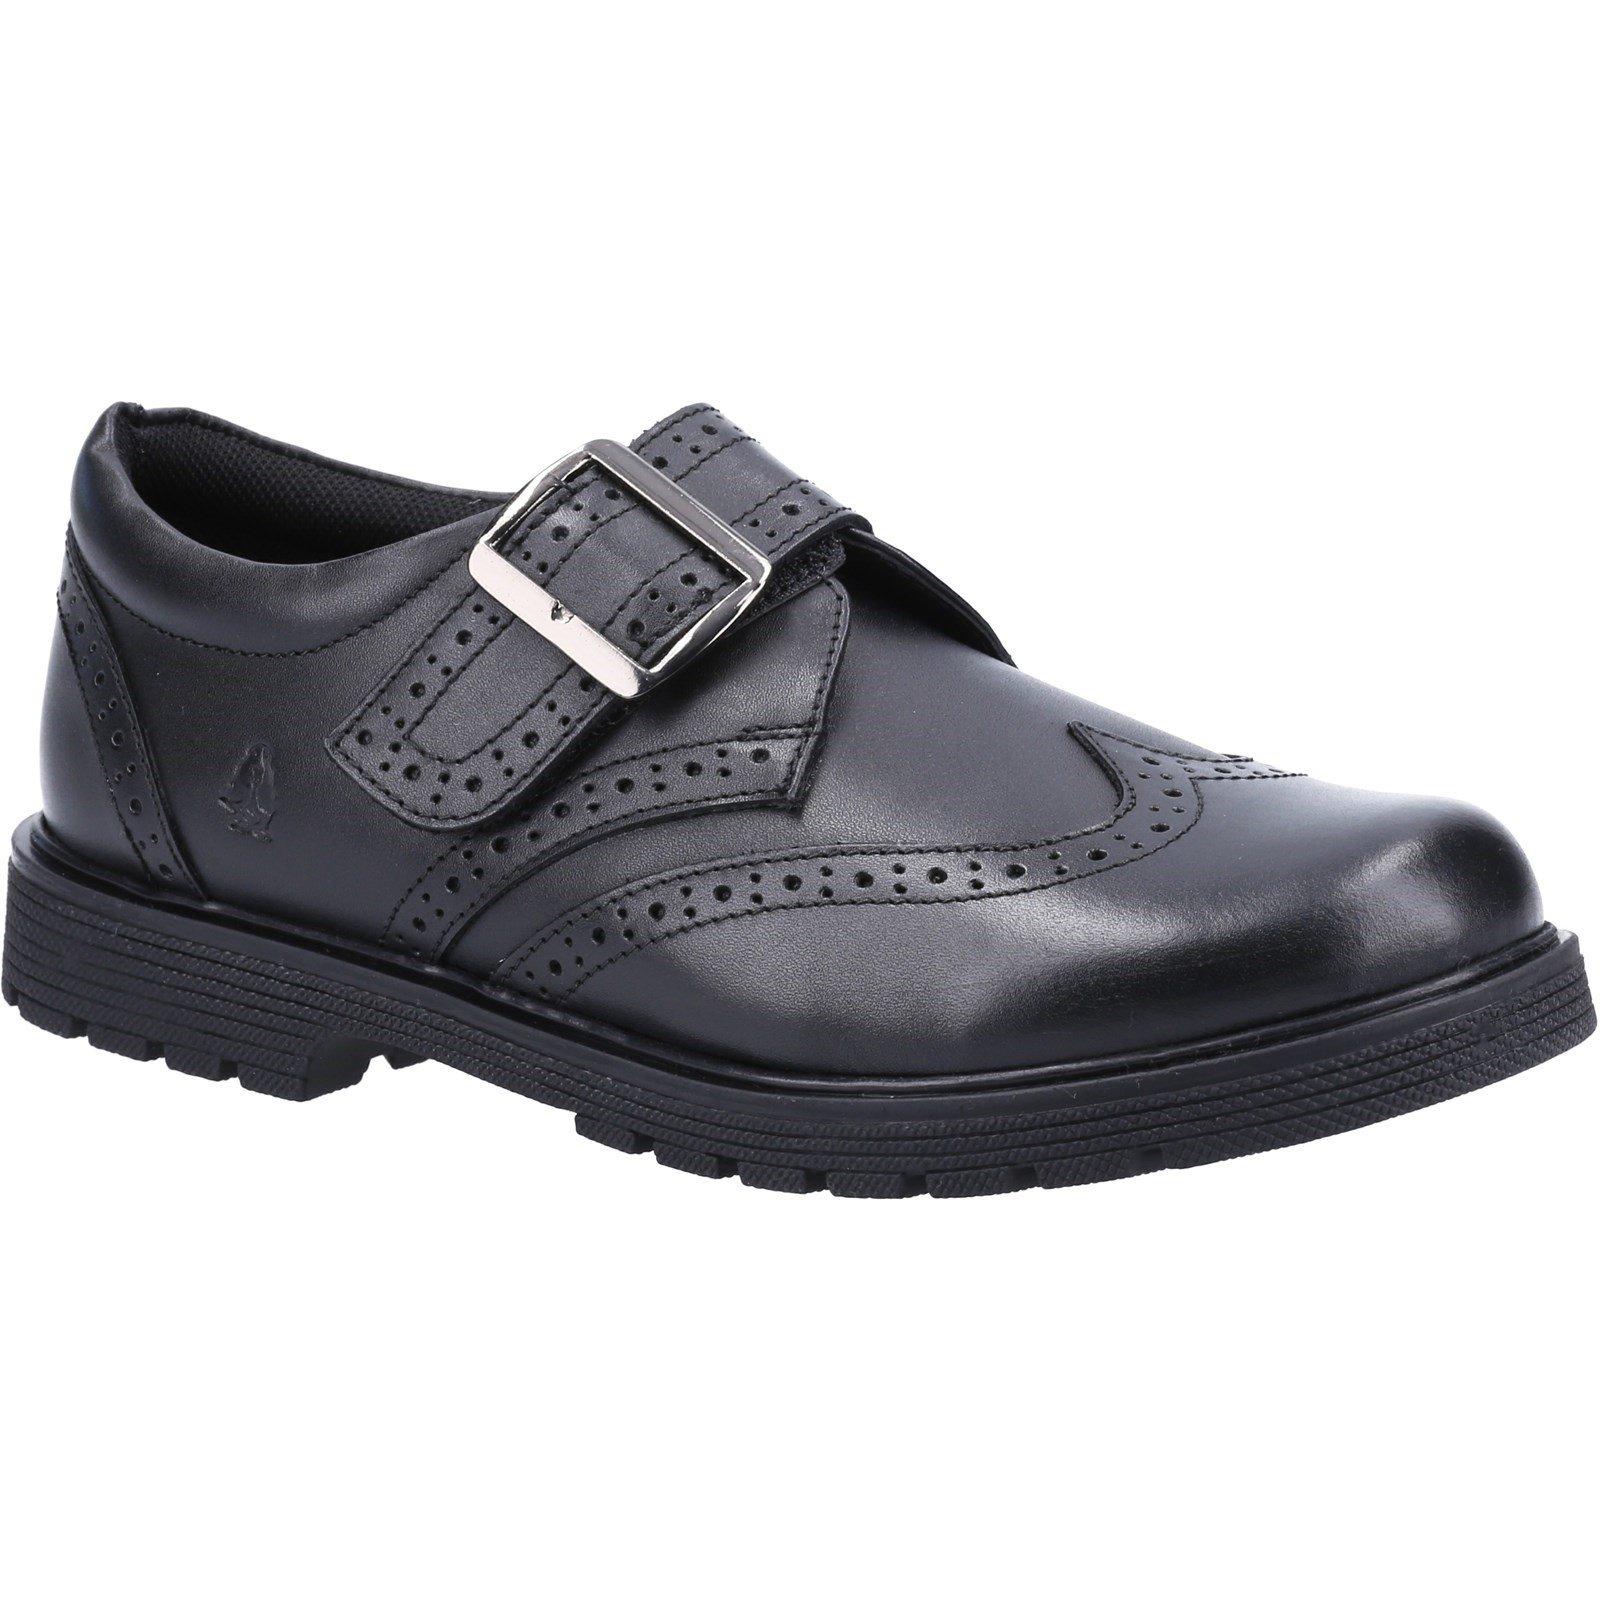 Hush Puppies Kid's Rhiannon Senior School Shoe Black 32626-55768 - Black 6